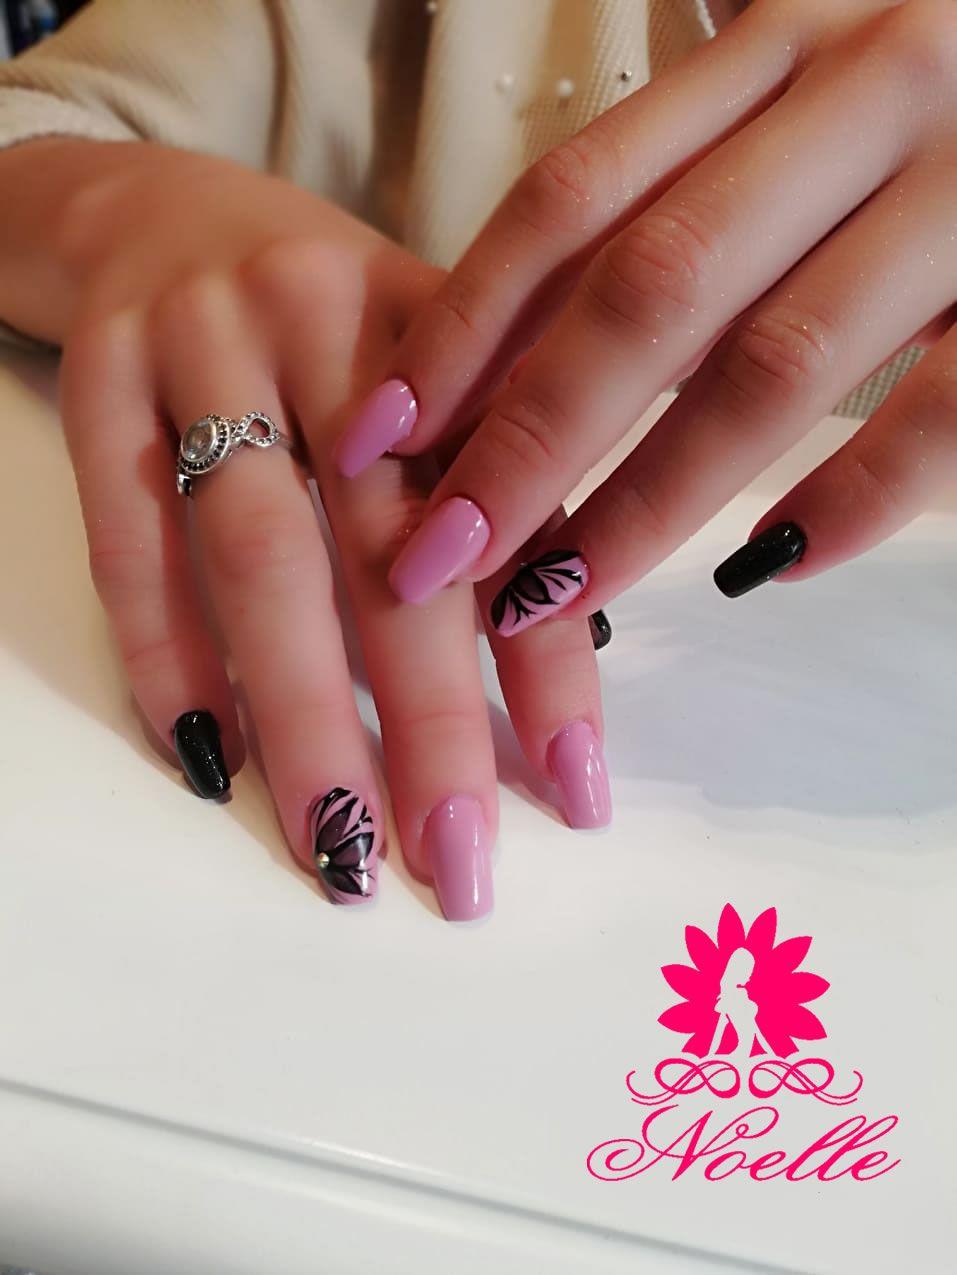 Njezna Finoca Nokti Noktizagreb Noktisavica With Images Facebook Sign Up Nails Zagreb